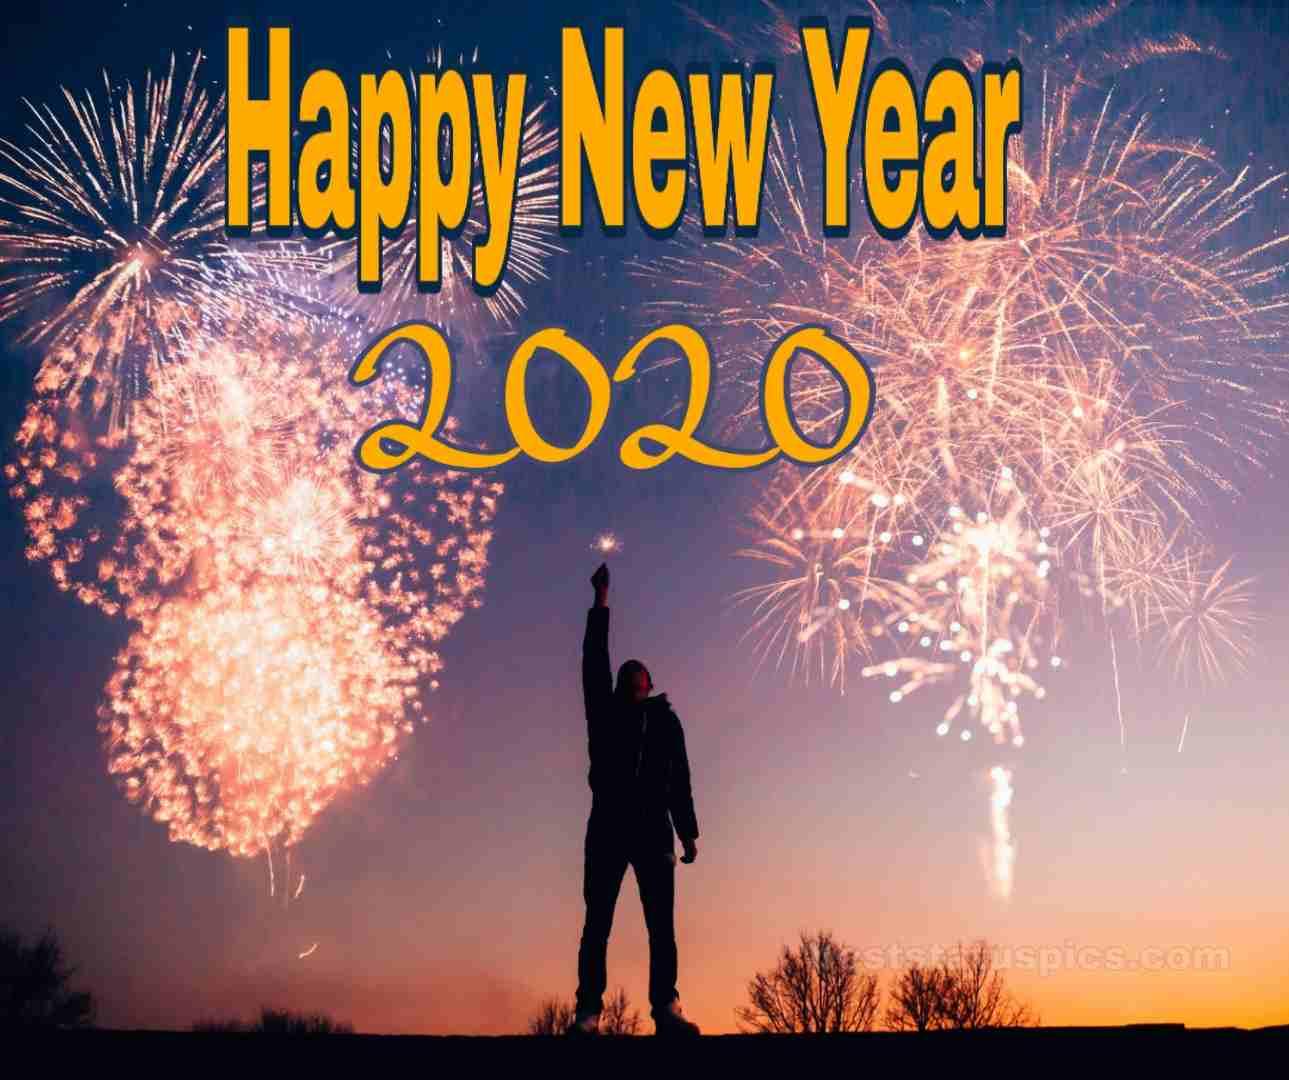 Attitude Happy New Year 2020 Image Whatsapp Dp